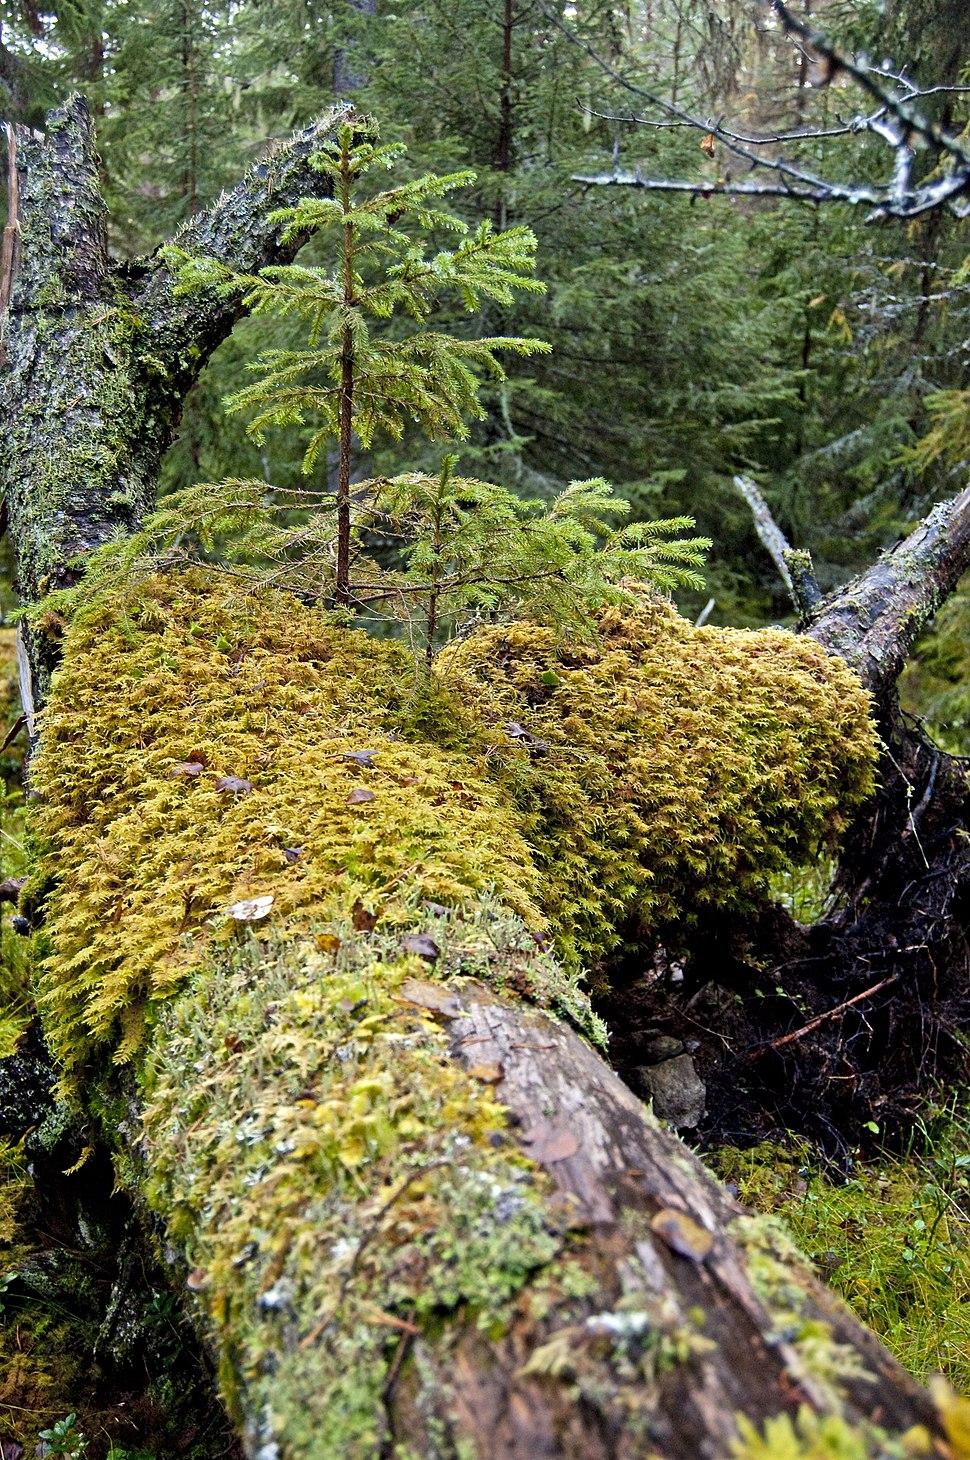 Berge naturreservat omkullfallet liten tall